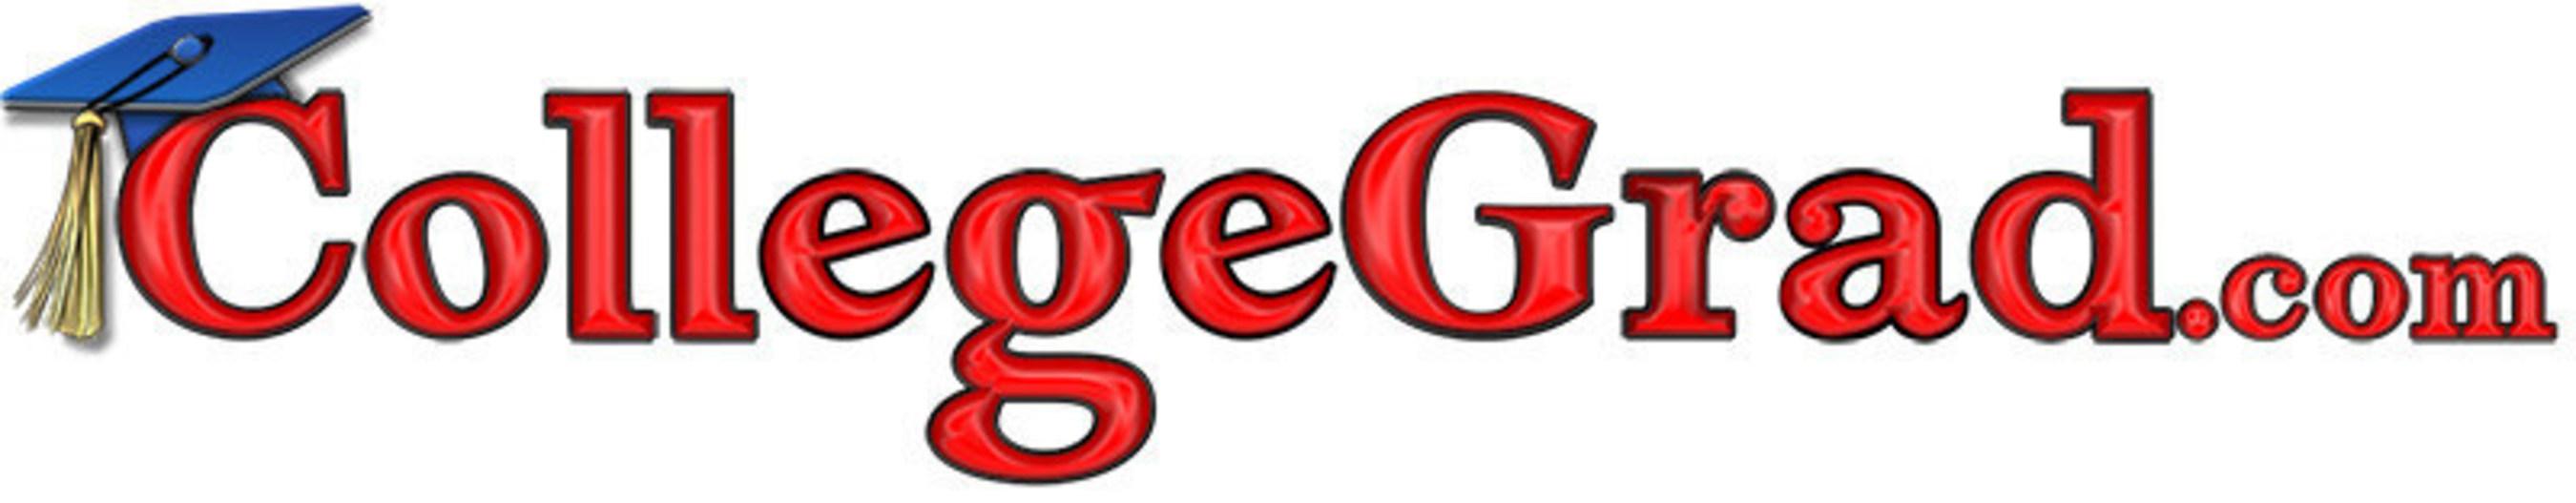 CollegeGrad.com survey results name Enterprise Rent-A-Car as the No. 1 Entry Level Employer for college graduates.